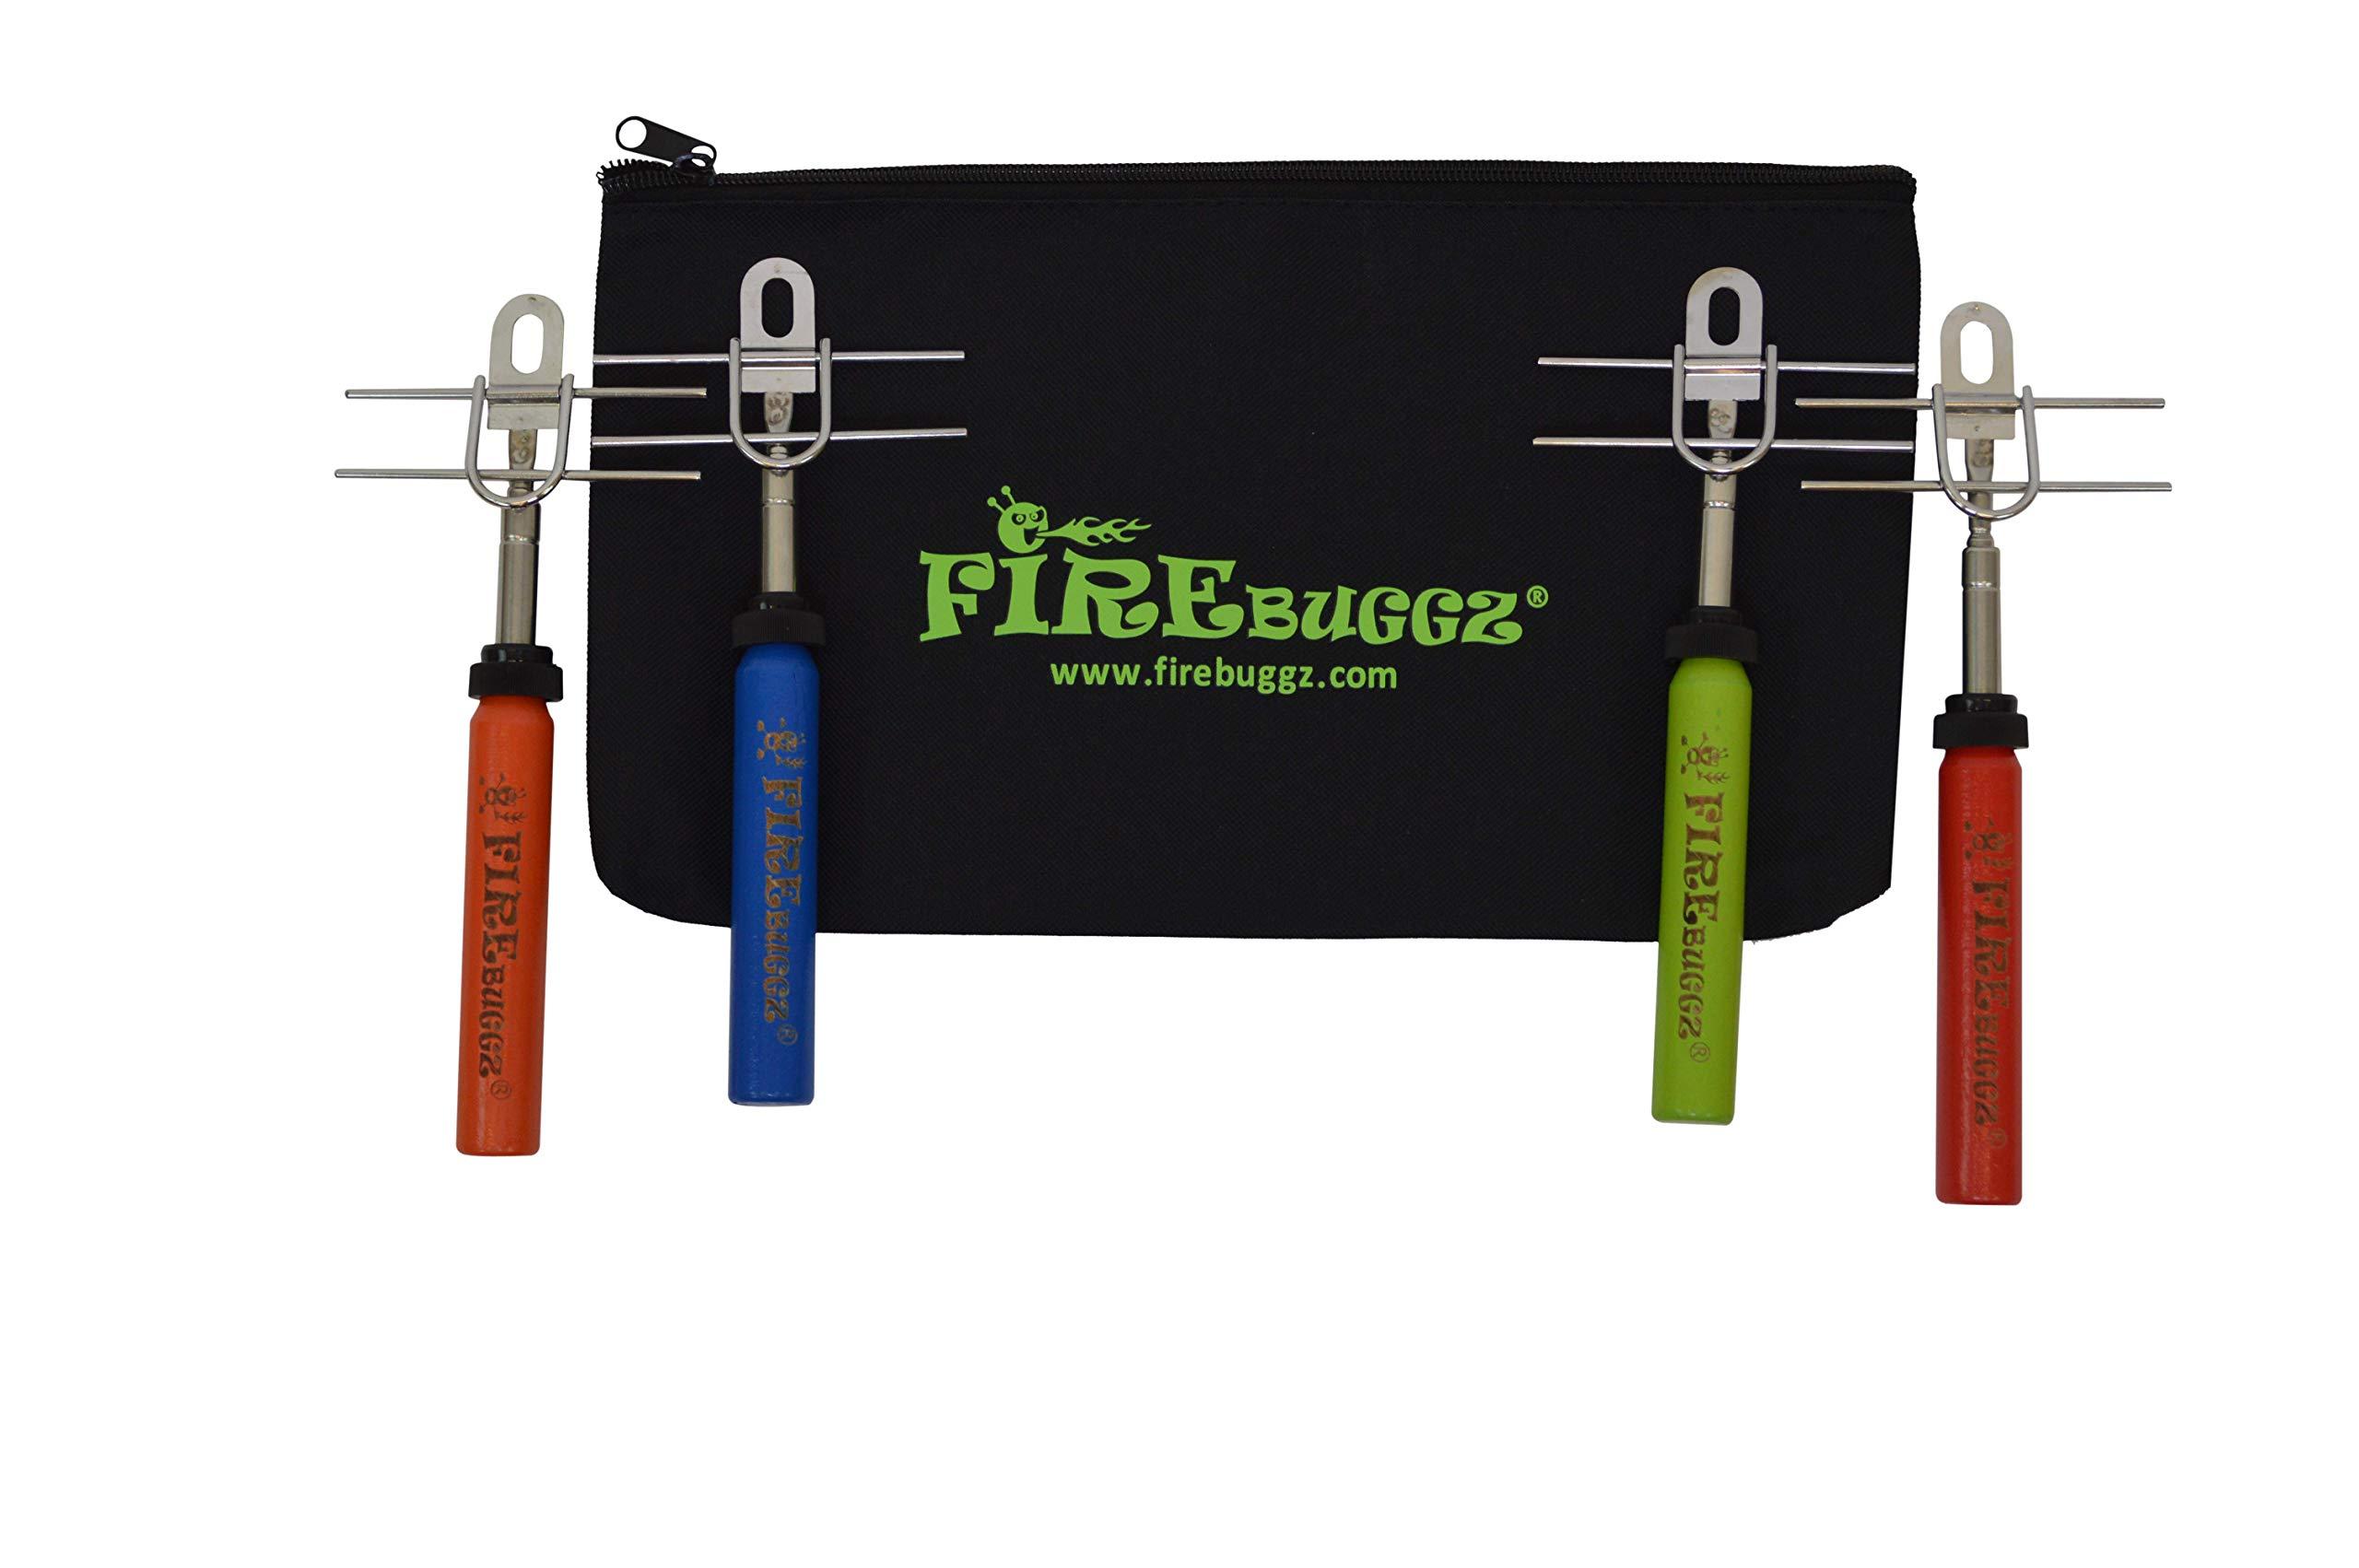 Firebuggz Flipp Stikk 4 Pack by Firebuggz